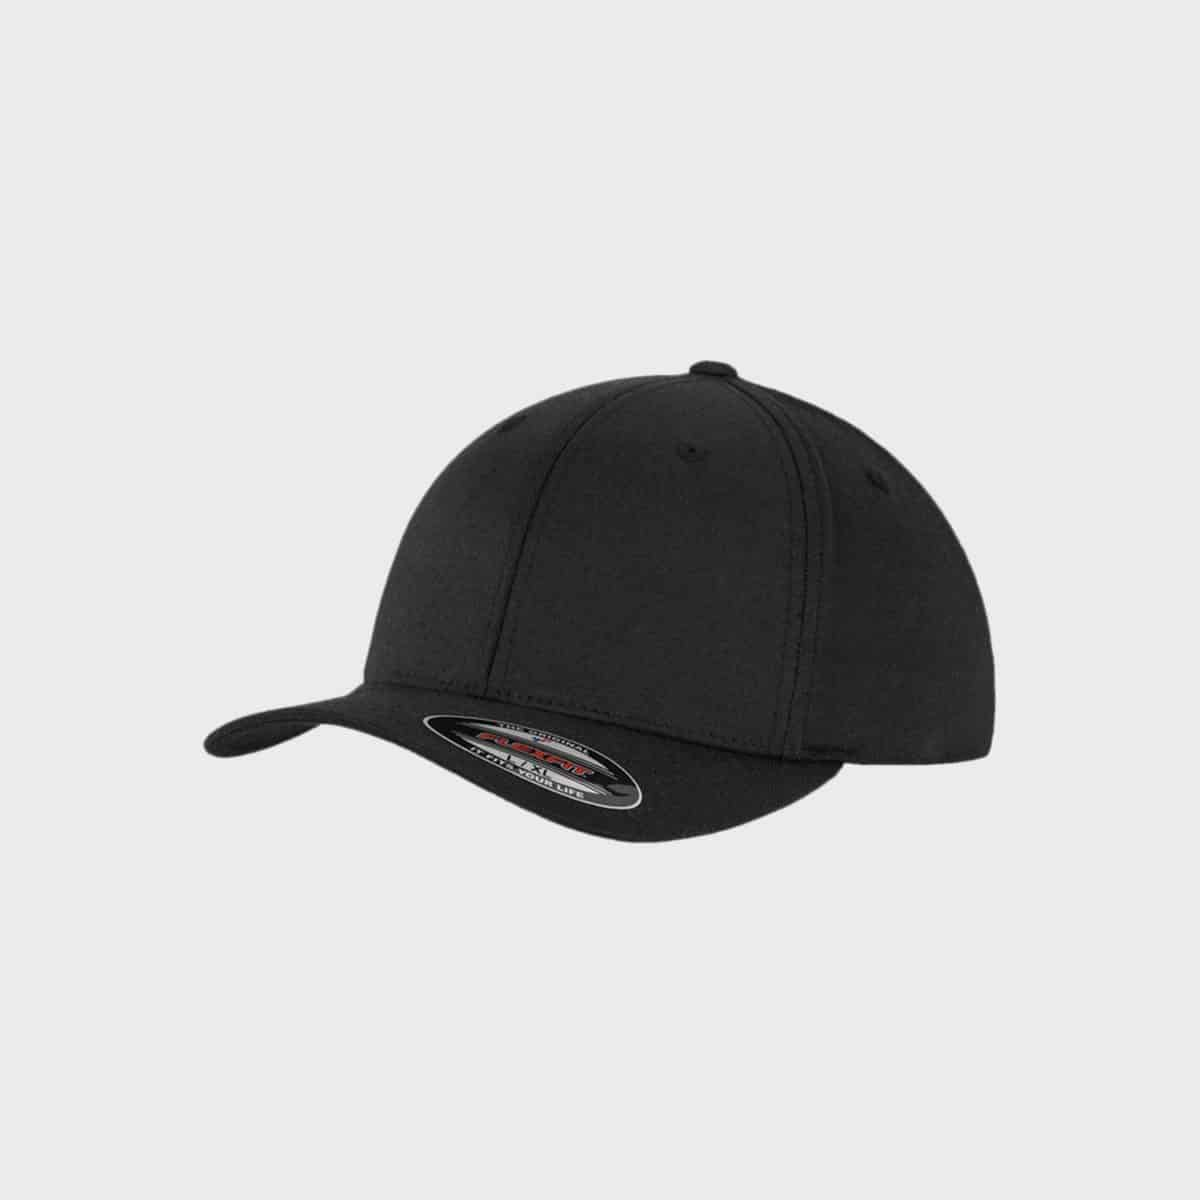 Flexfit MarkenCaps FFE 6588 Black Front Side